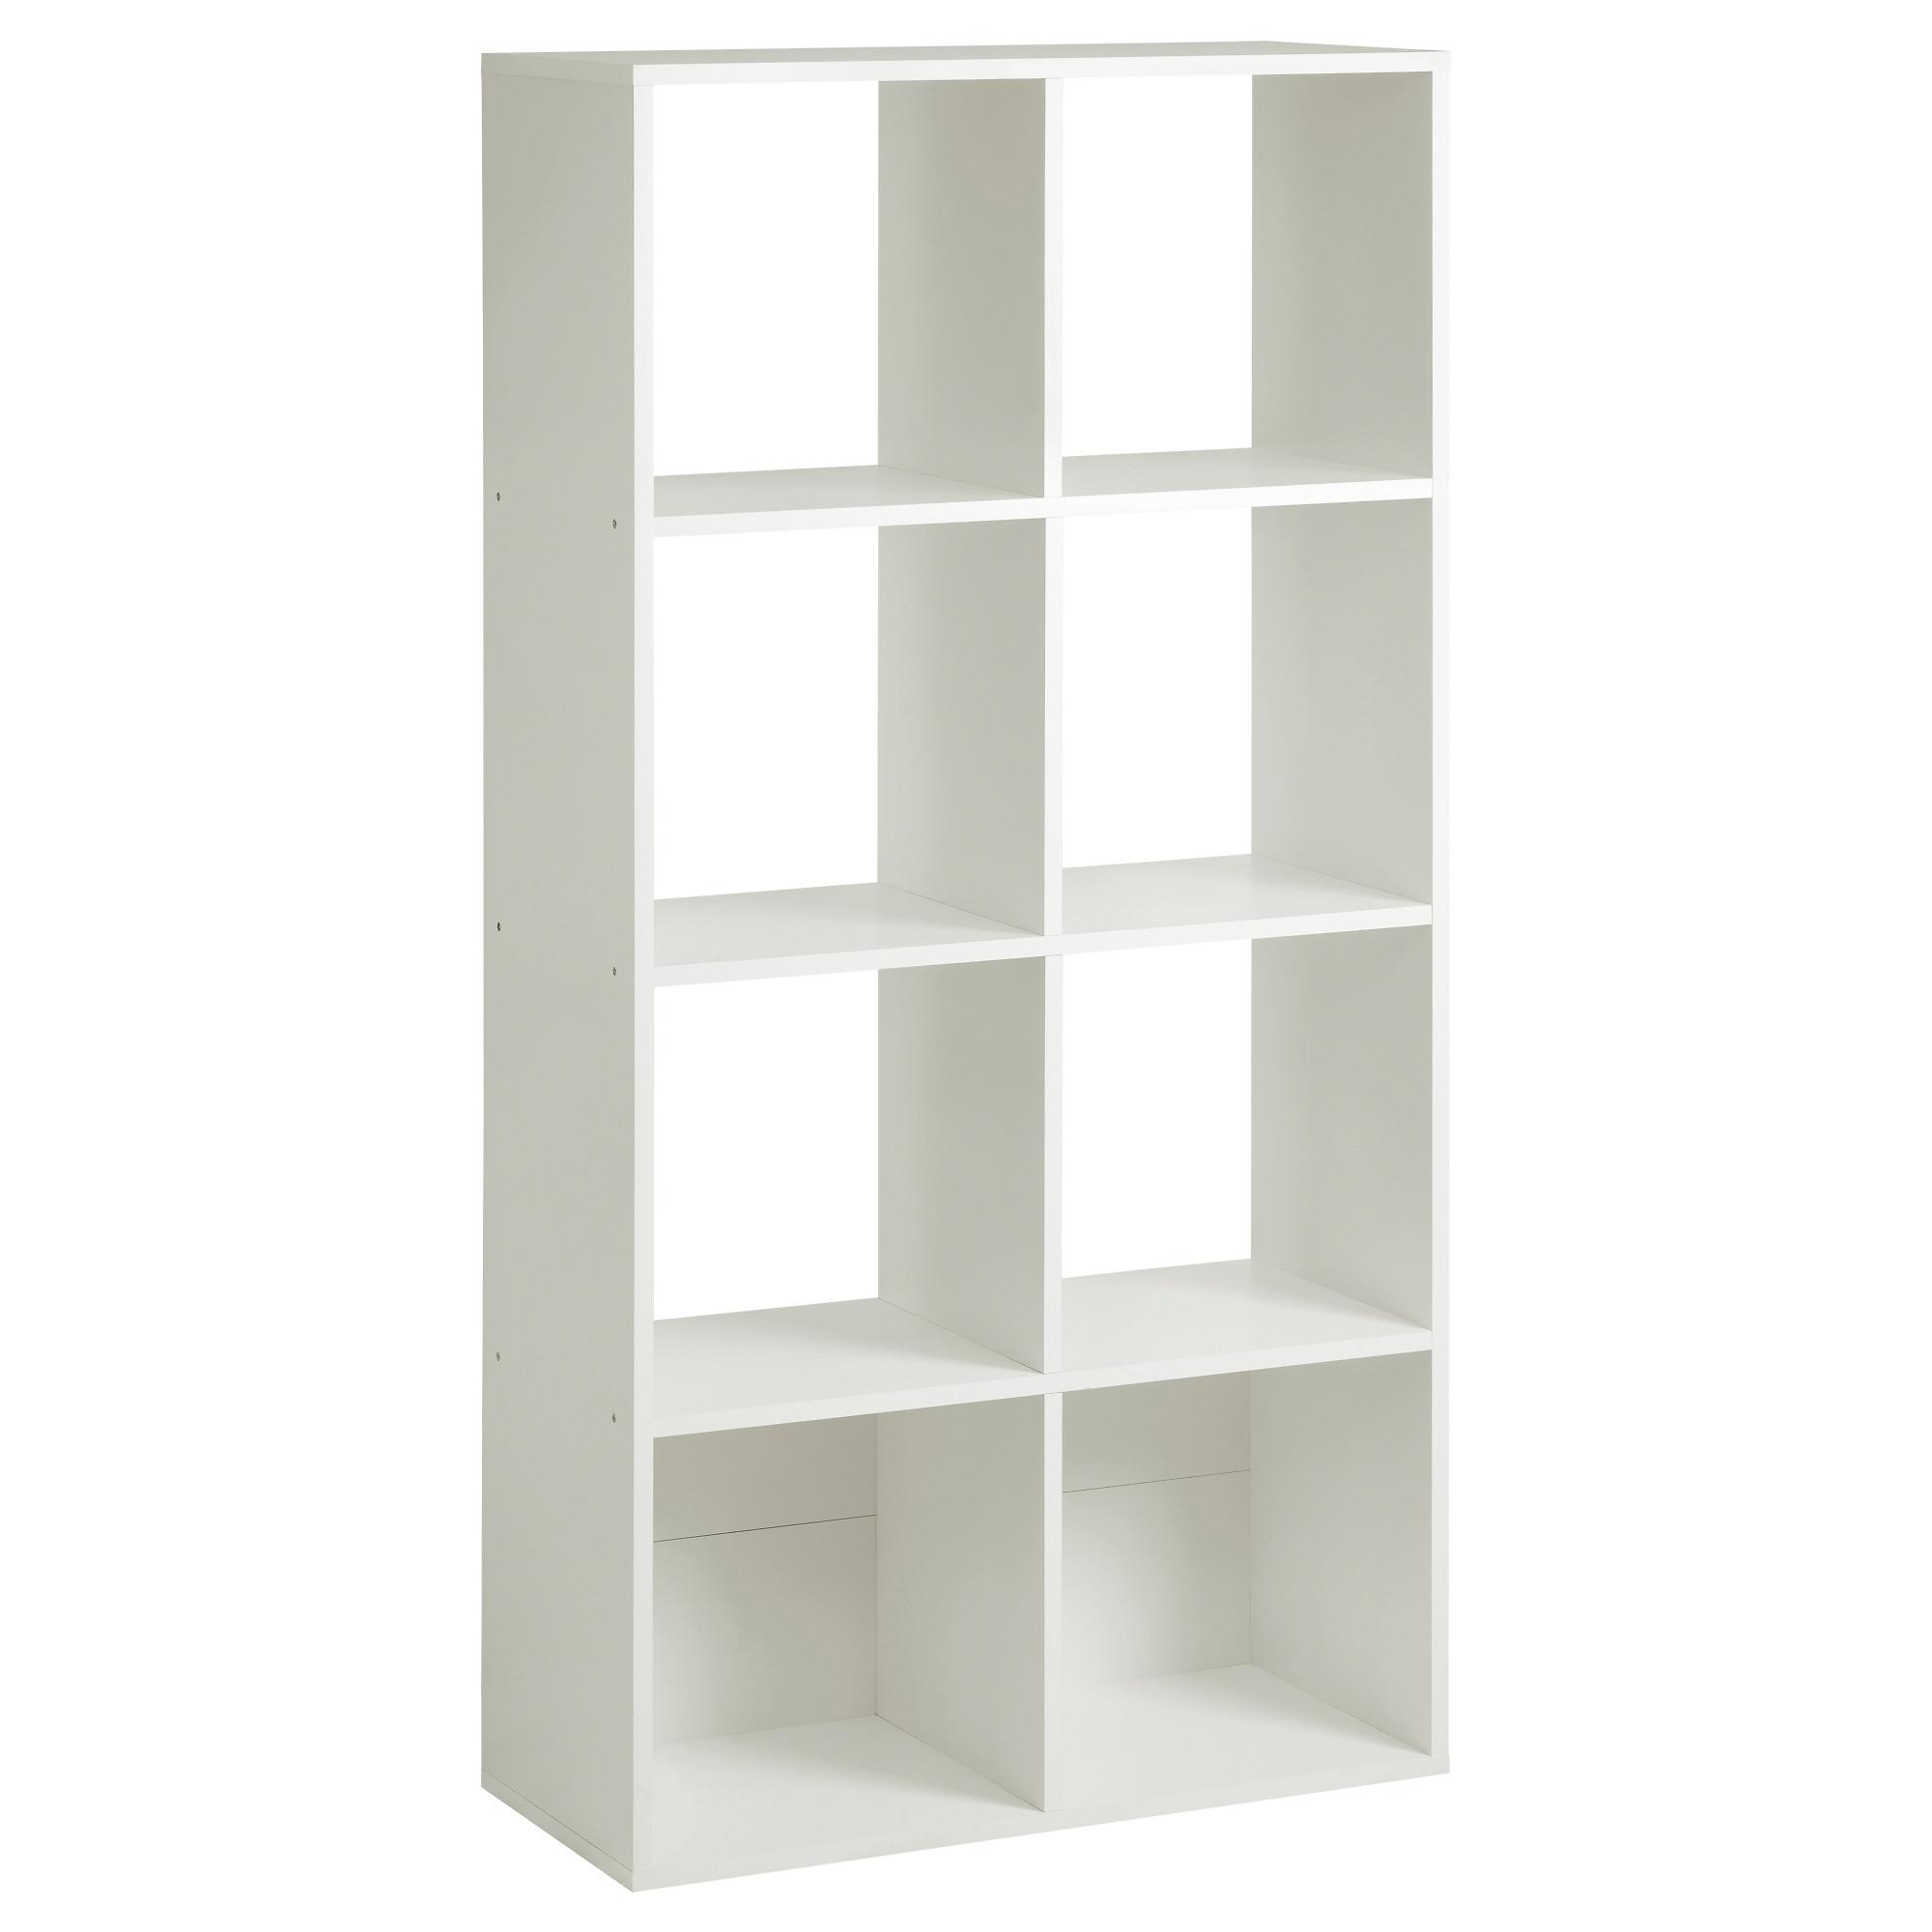 Well Liked 32 Ikea White Shelves Unit, Kallax Shelving Unit High Gloss White In White Shelving Units (View 10 of 15)